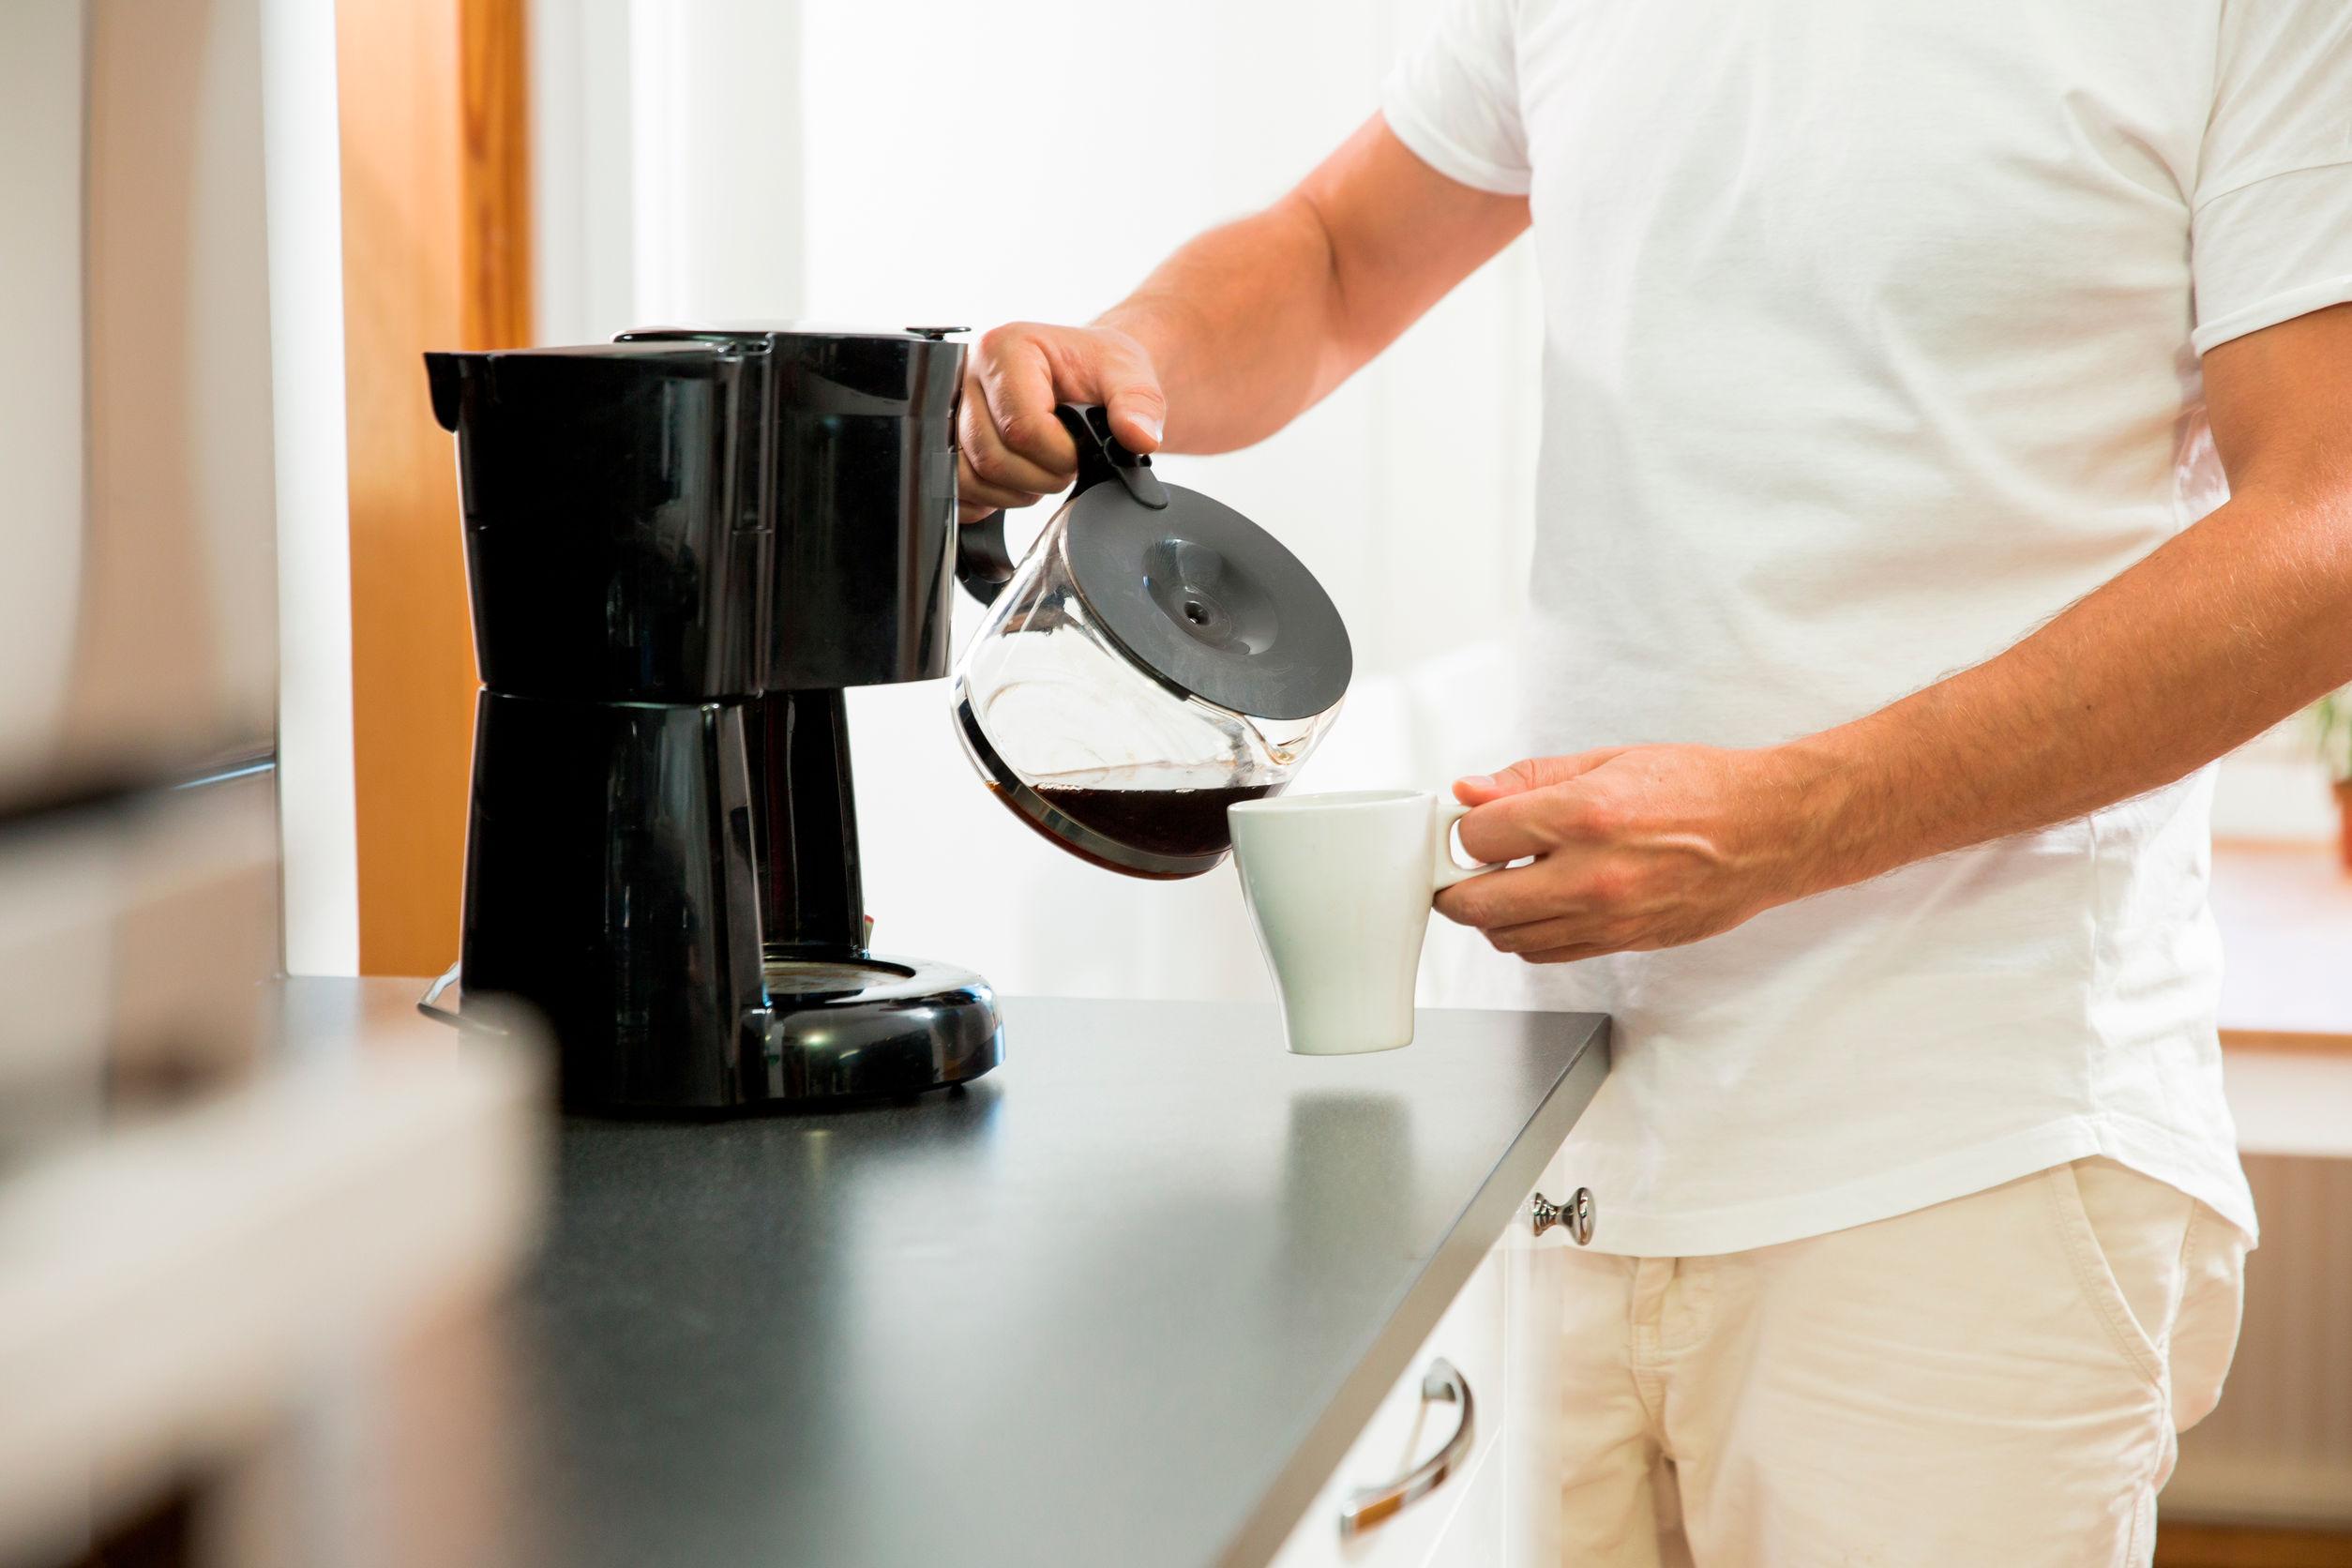 Hombre de camisa blanca tomando café de cafetera eléctrica